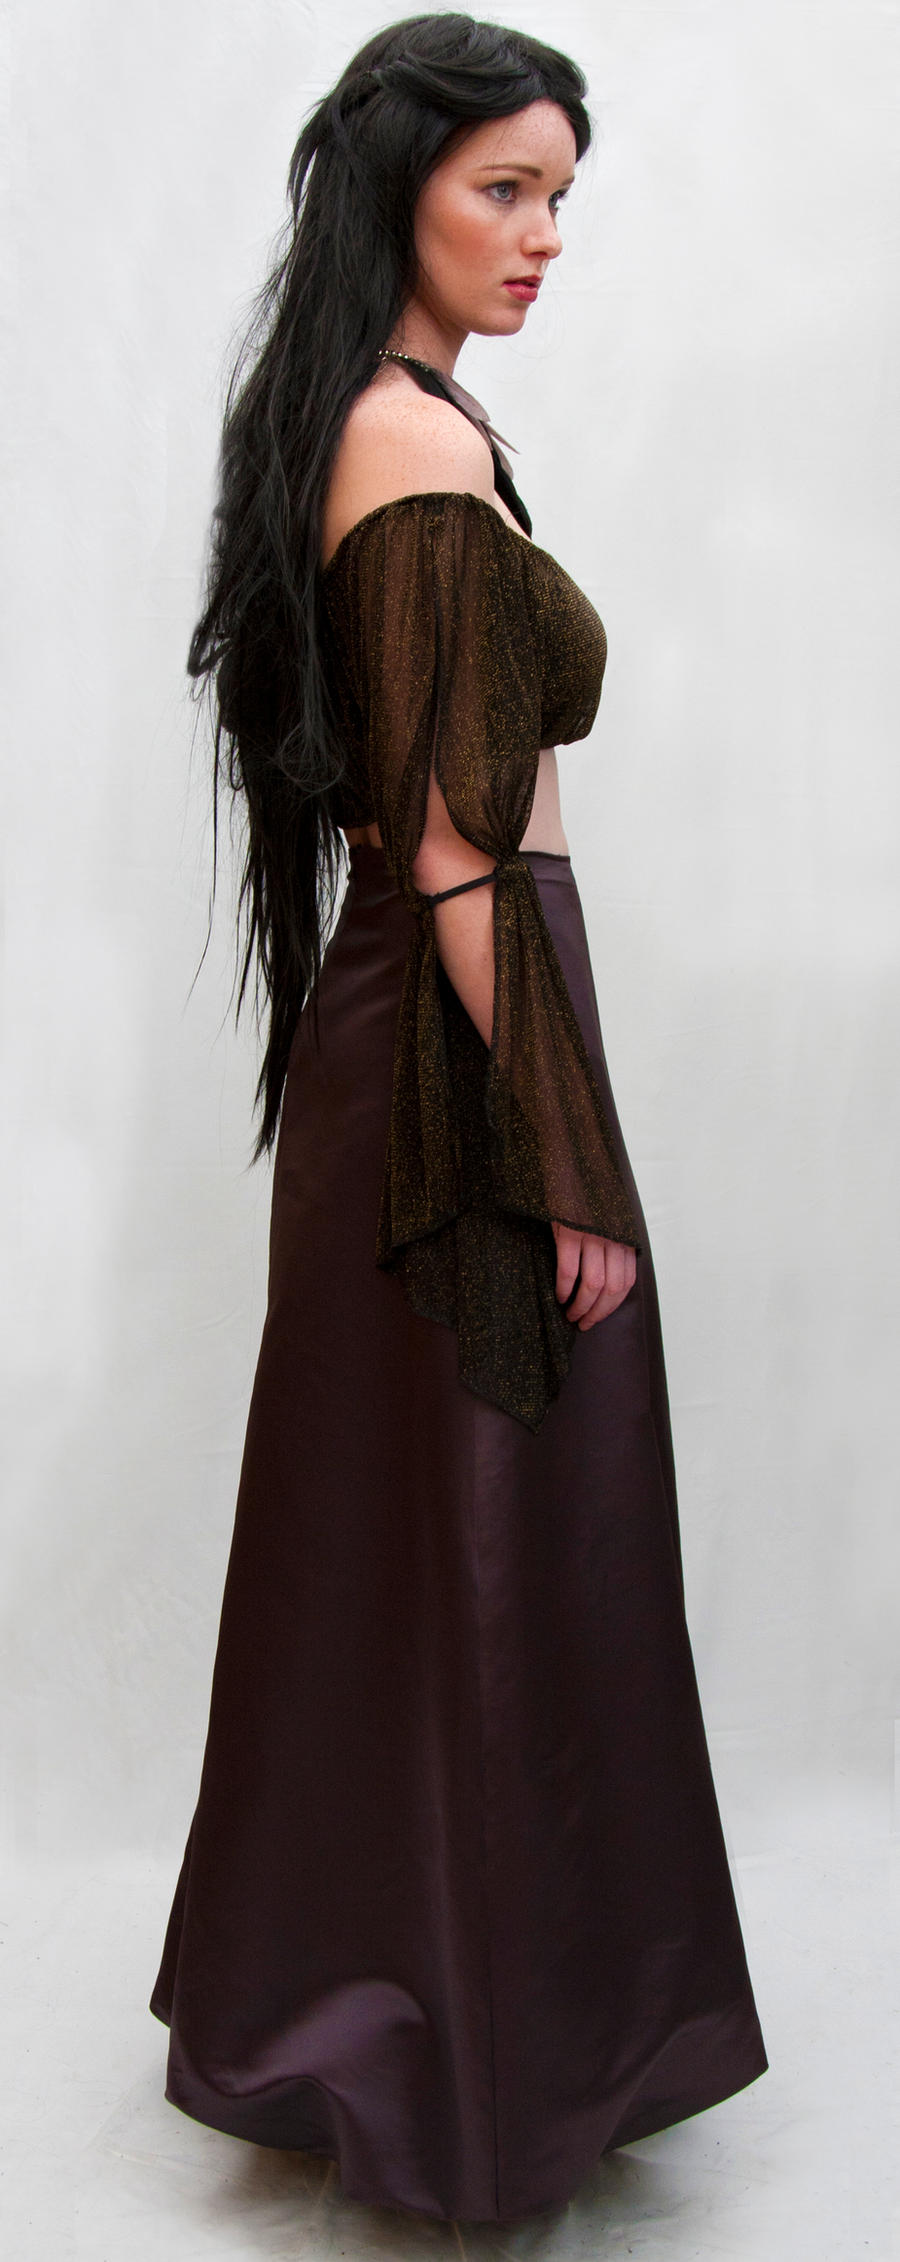 Rebekah 9 by CathleenTarawhiti